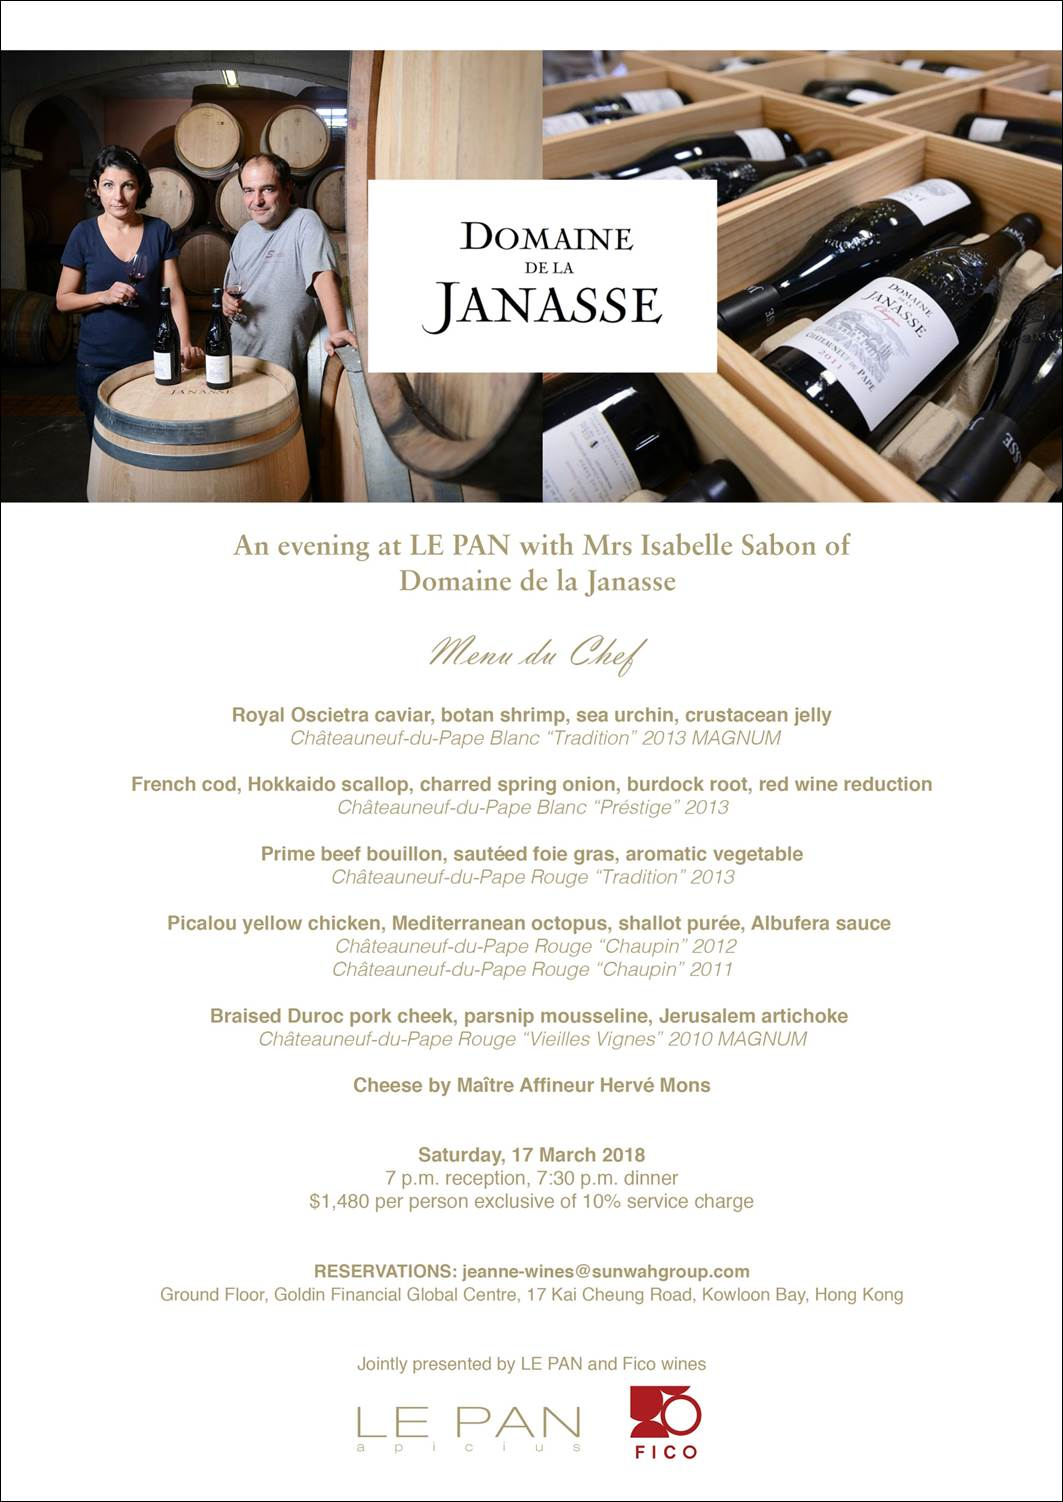 DOMAINE-DE-LA-JANASSE-WINE-DINNER.jpg